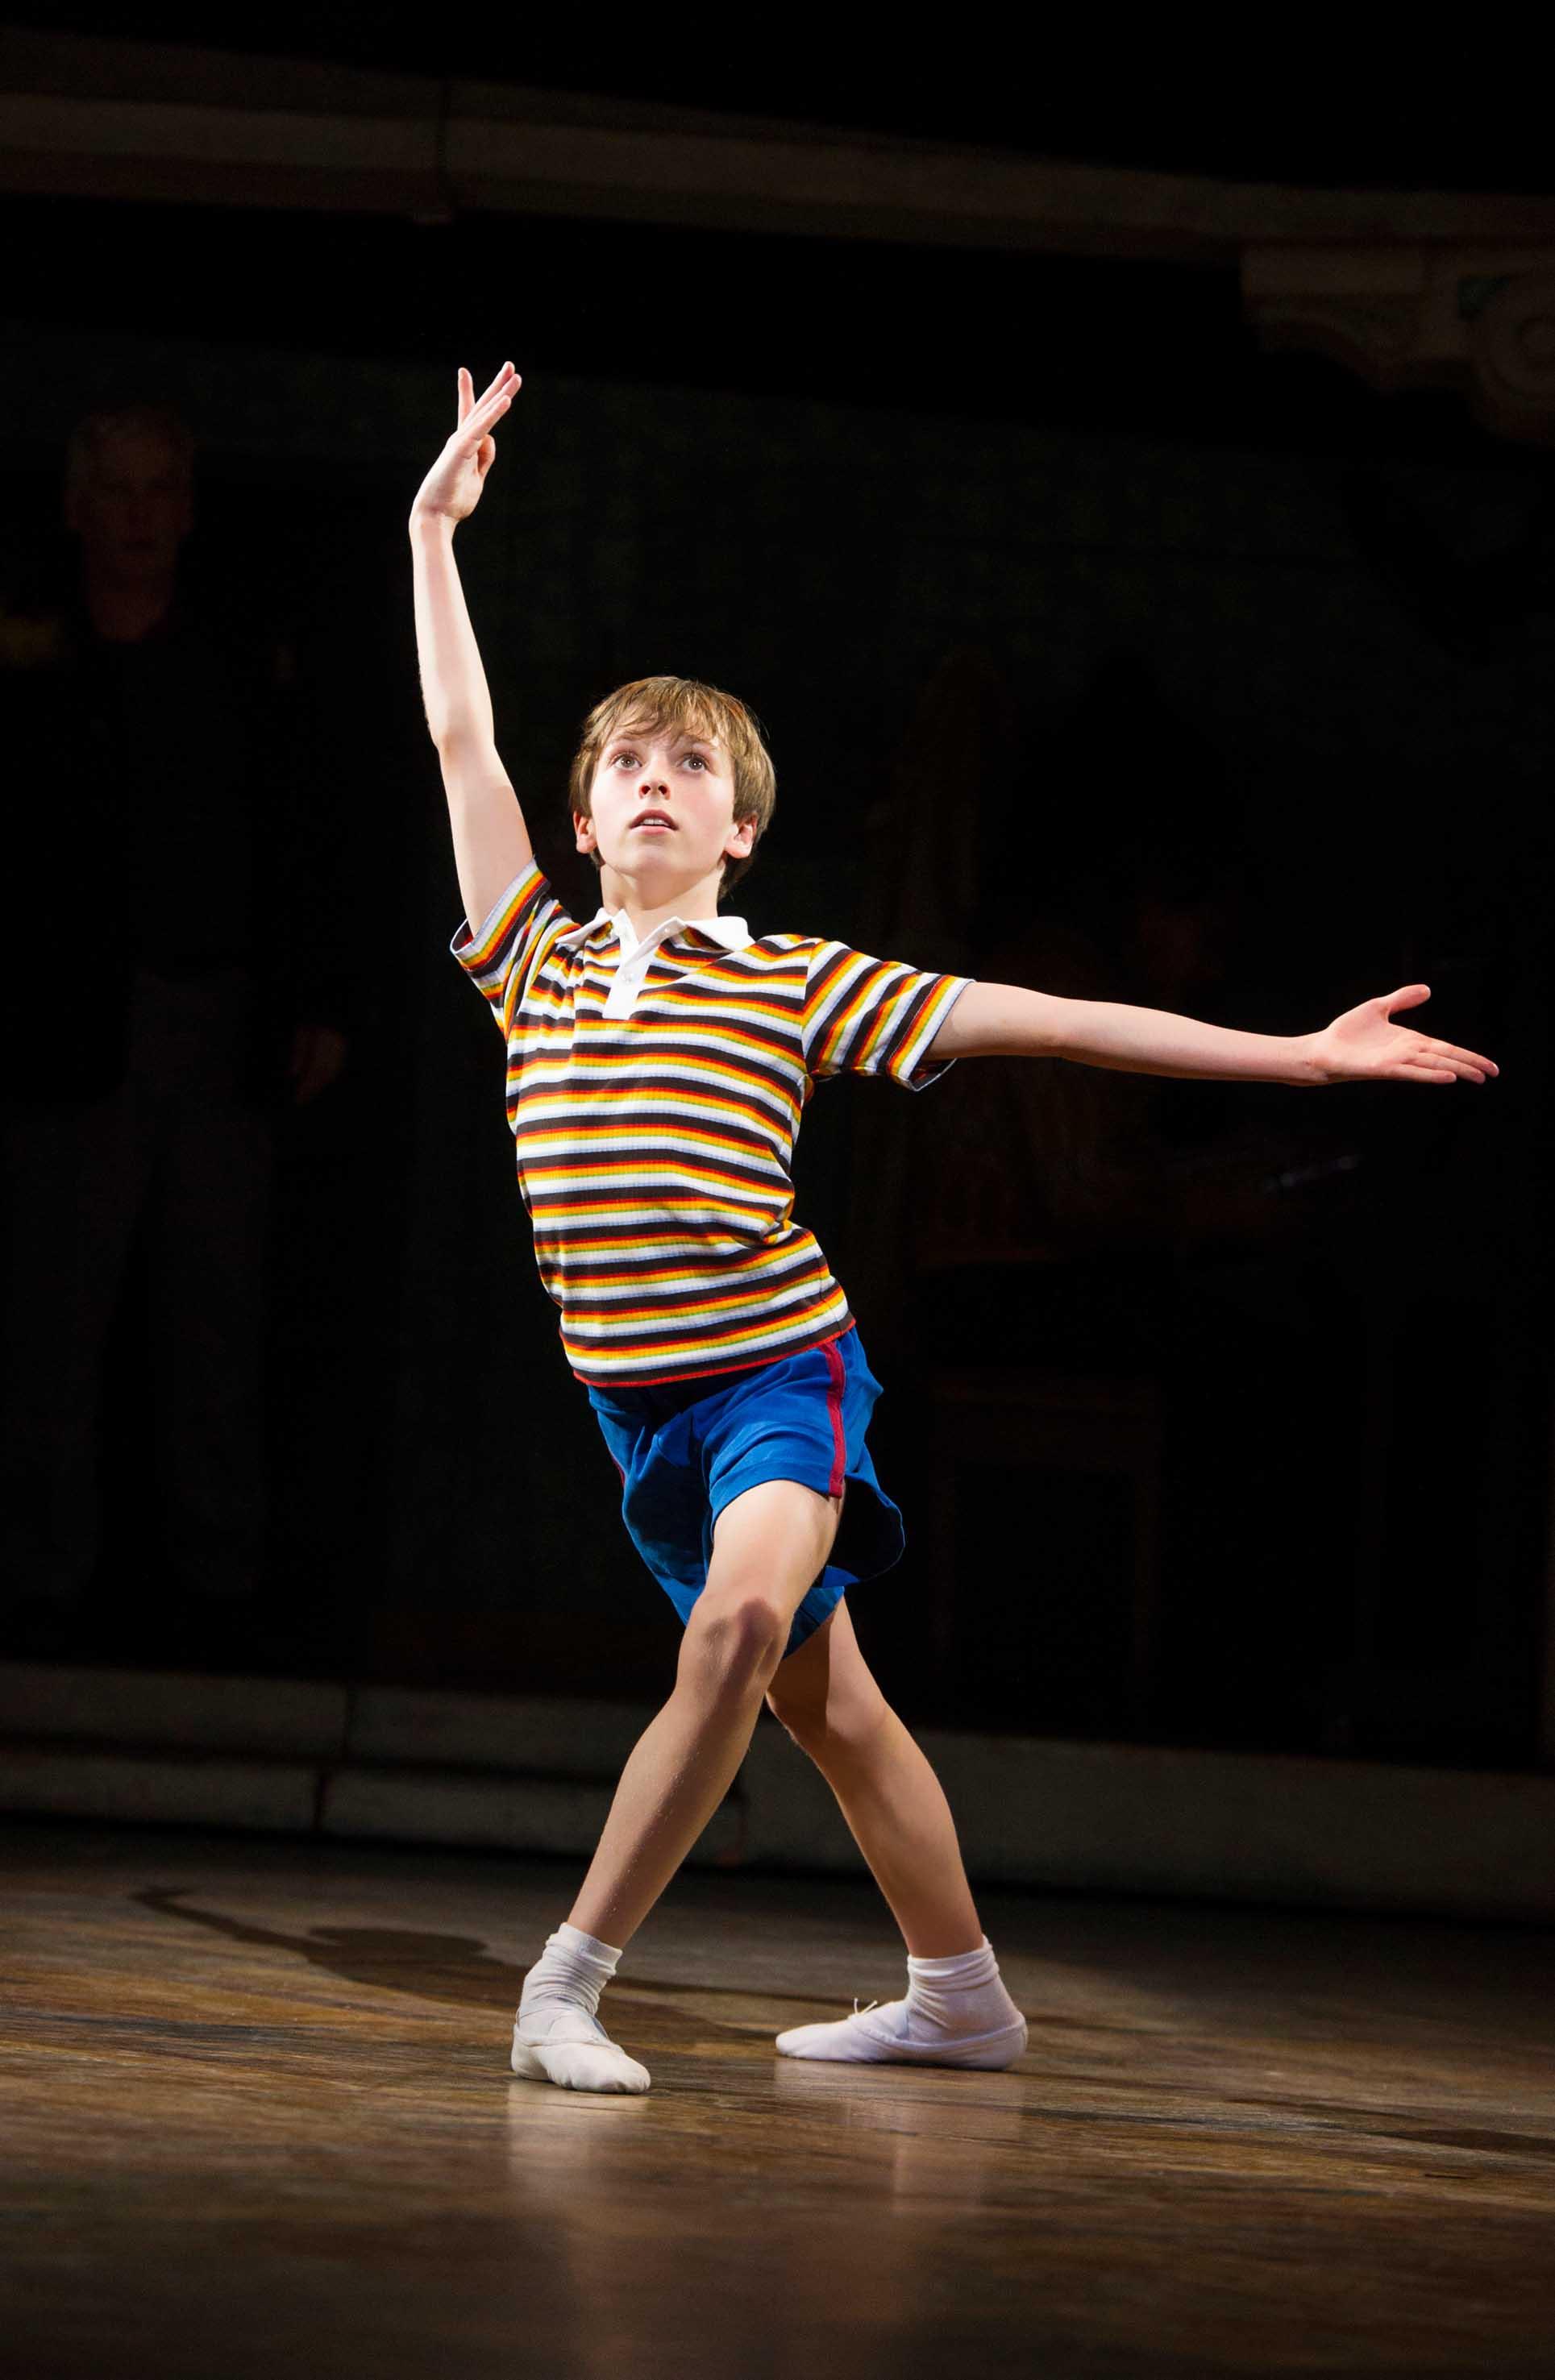 Nat Sweeney the 41st Billy Elliot